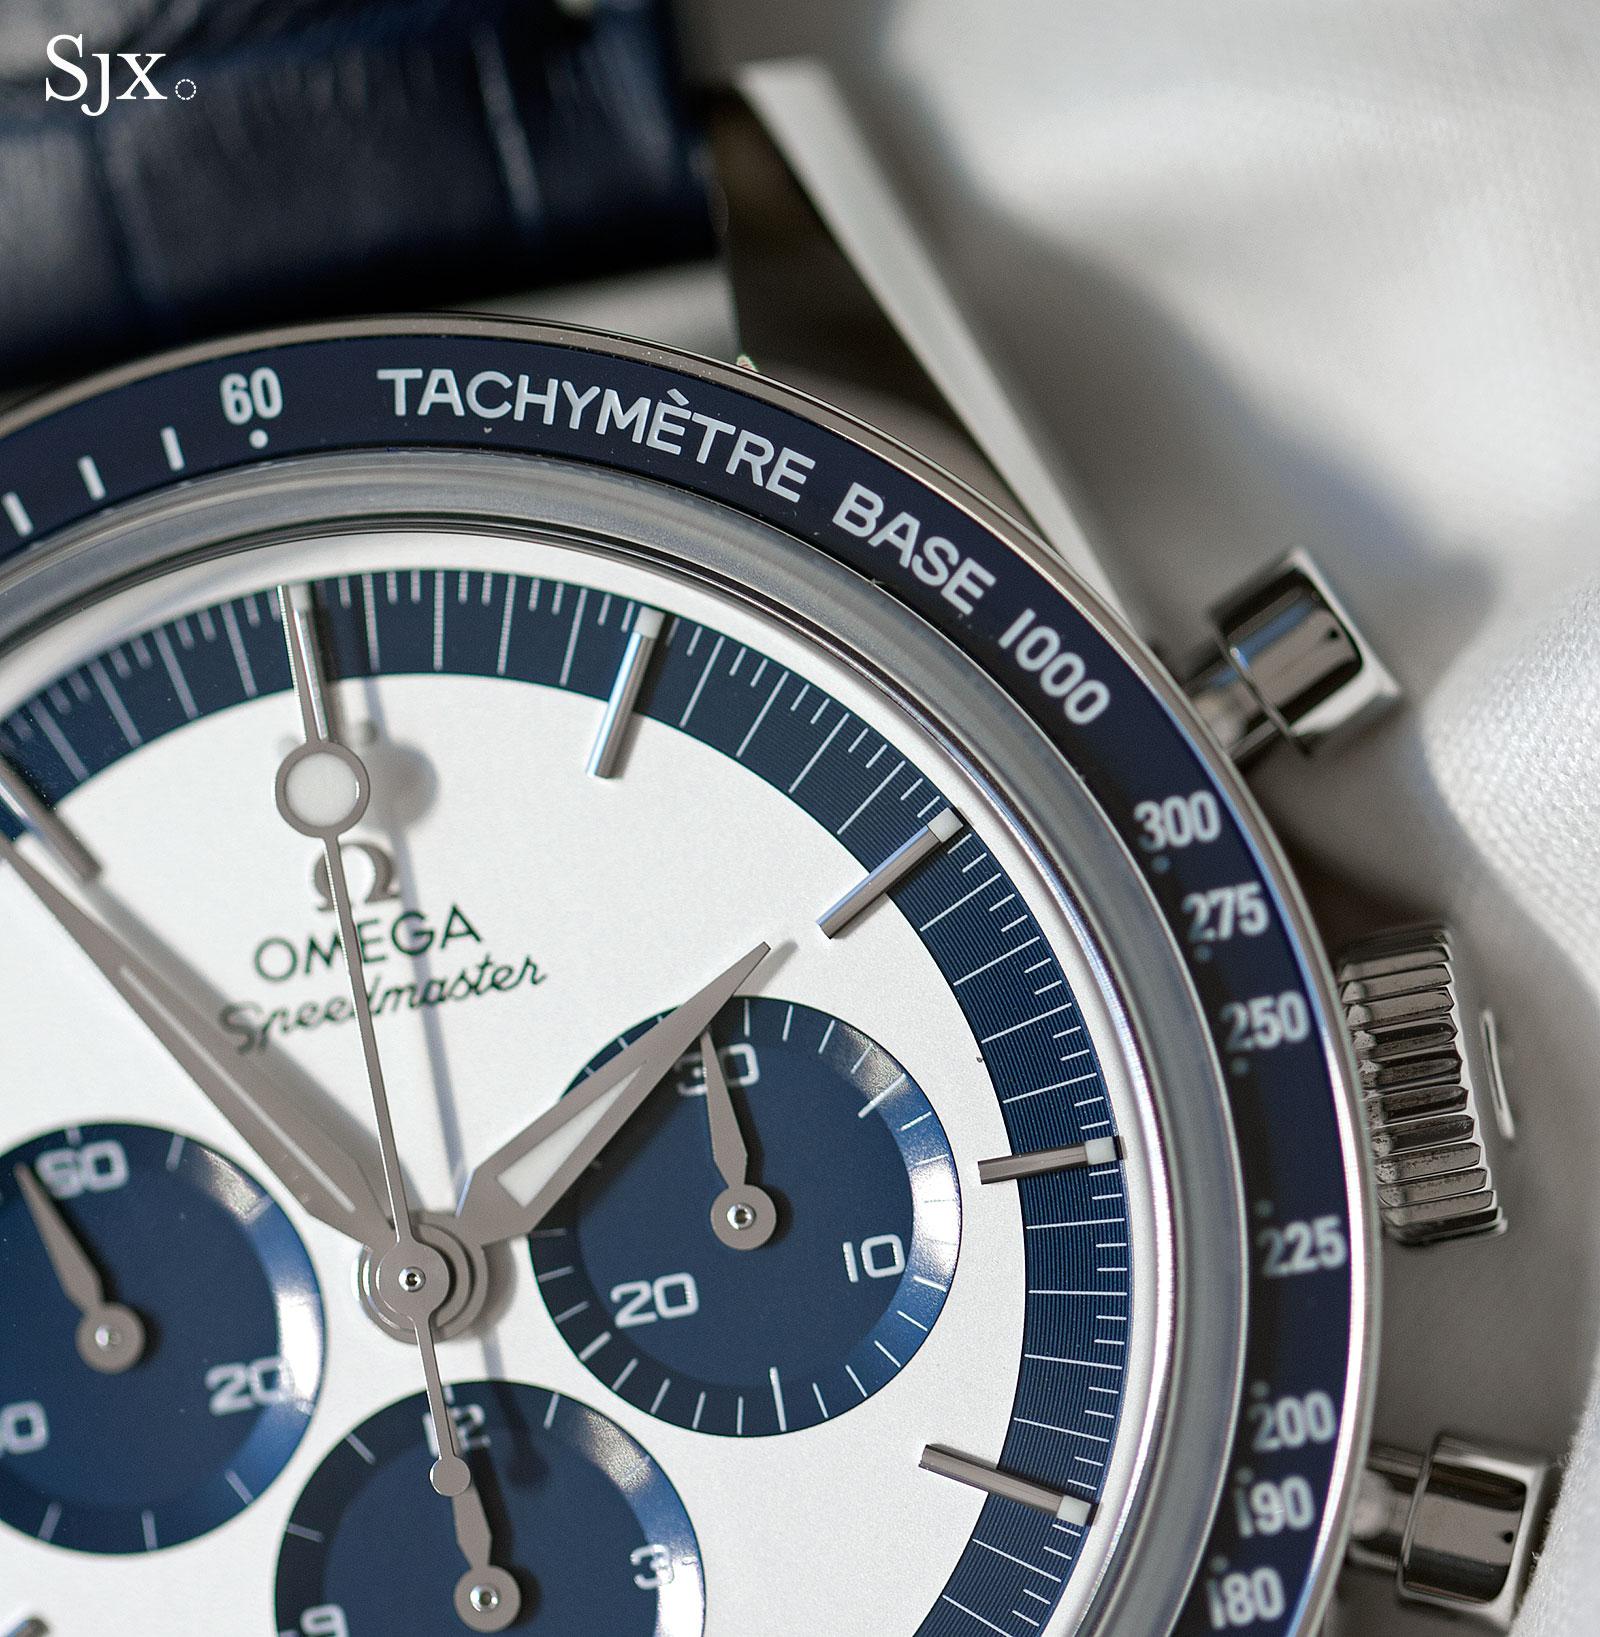 Omega Speedmaster Moonwatch CK2998 - 6